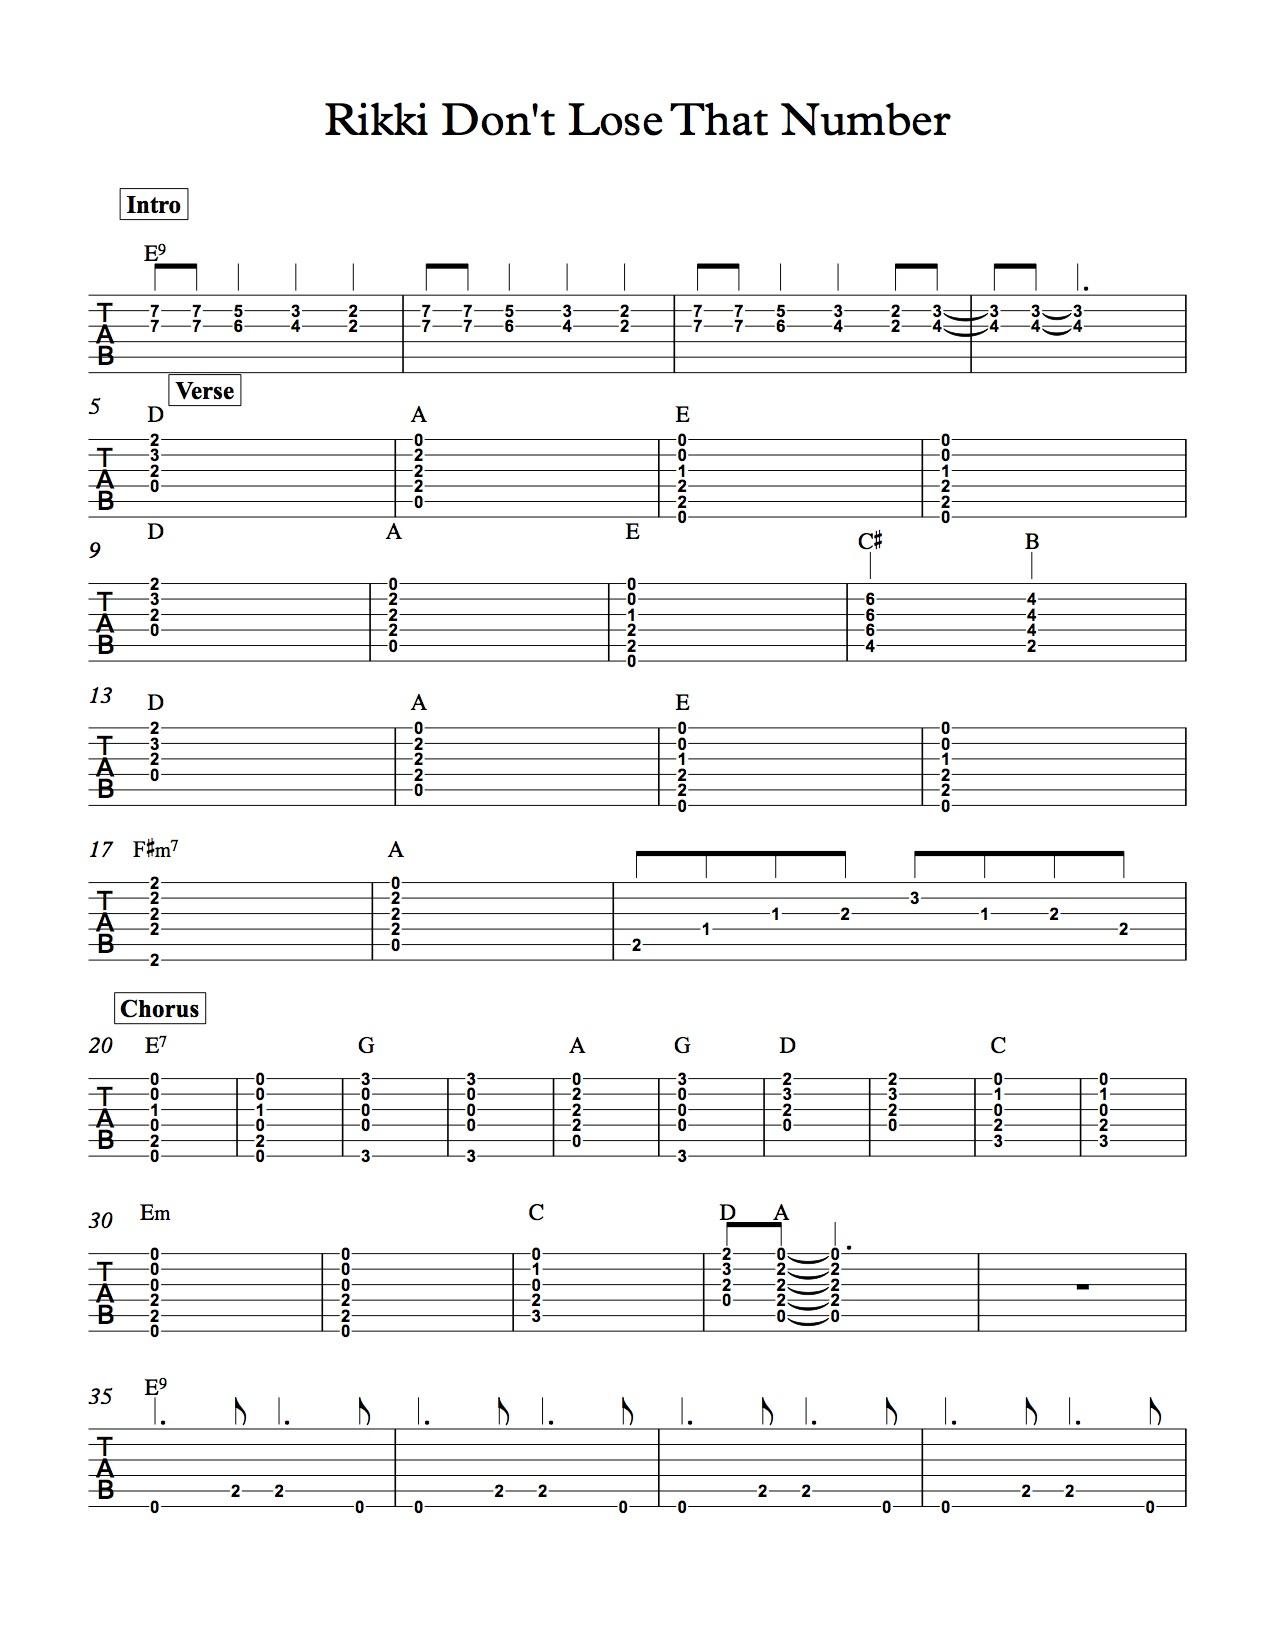 Peaceful Easy Feeling Chords Guitar The Eagles Peaceful Easy